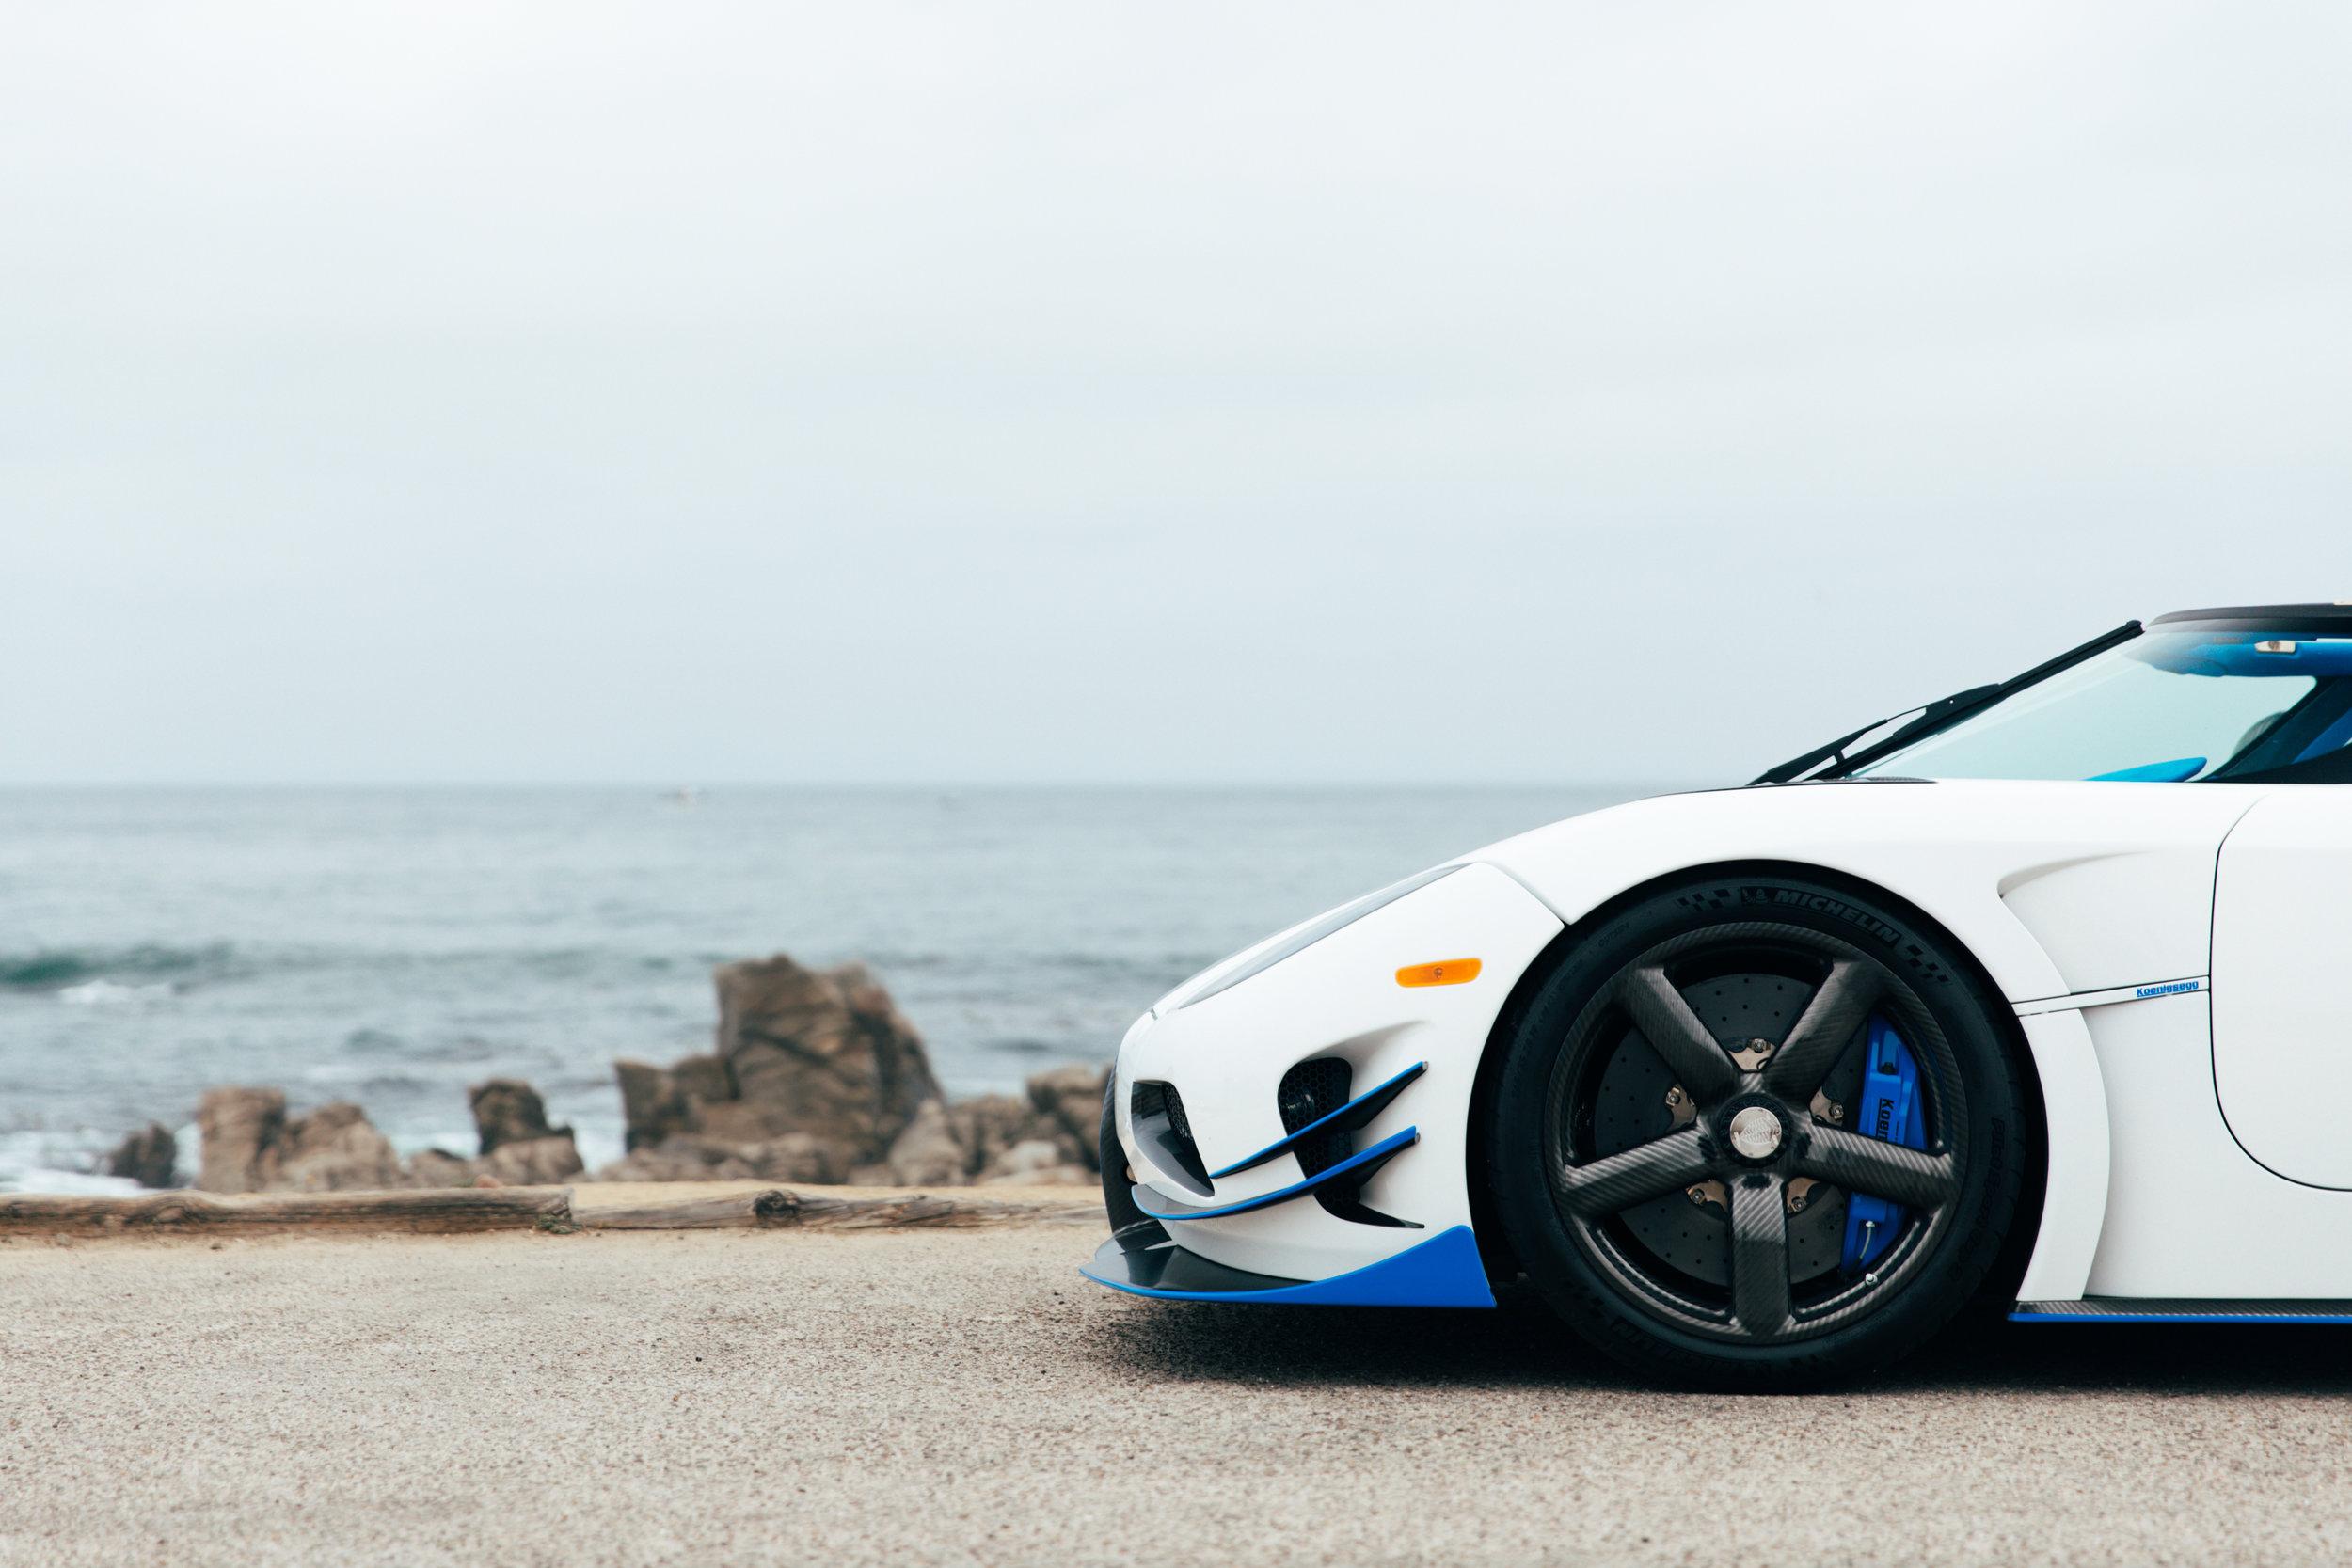 Stay_Driven_Monterey_Car_Week_Whitesse_Koenigsegg-28.jpg